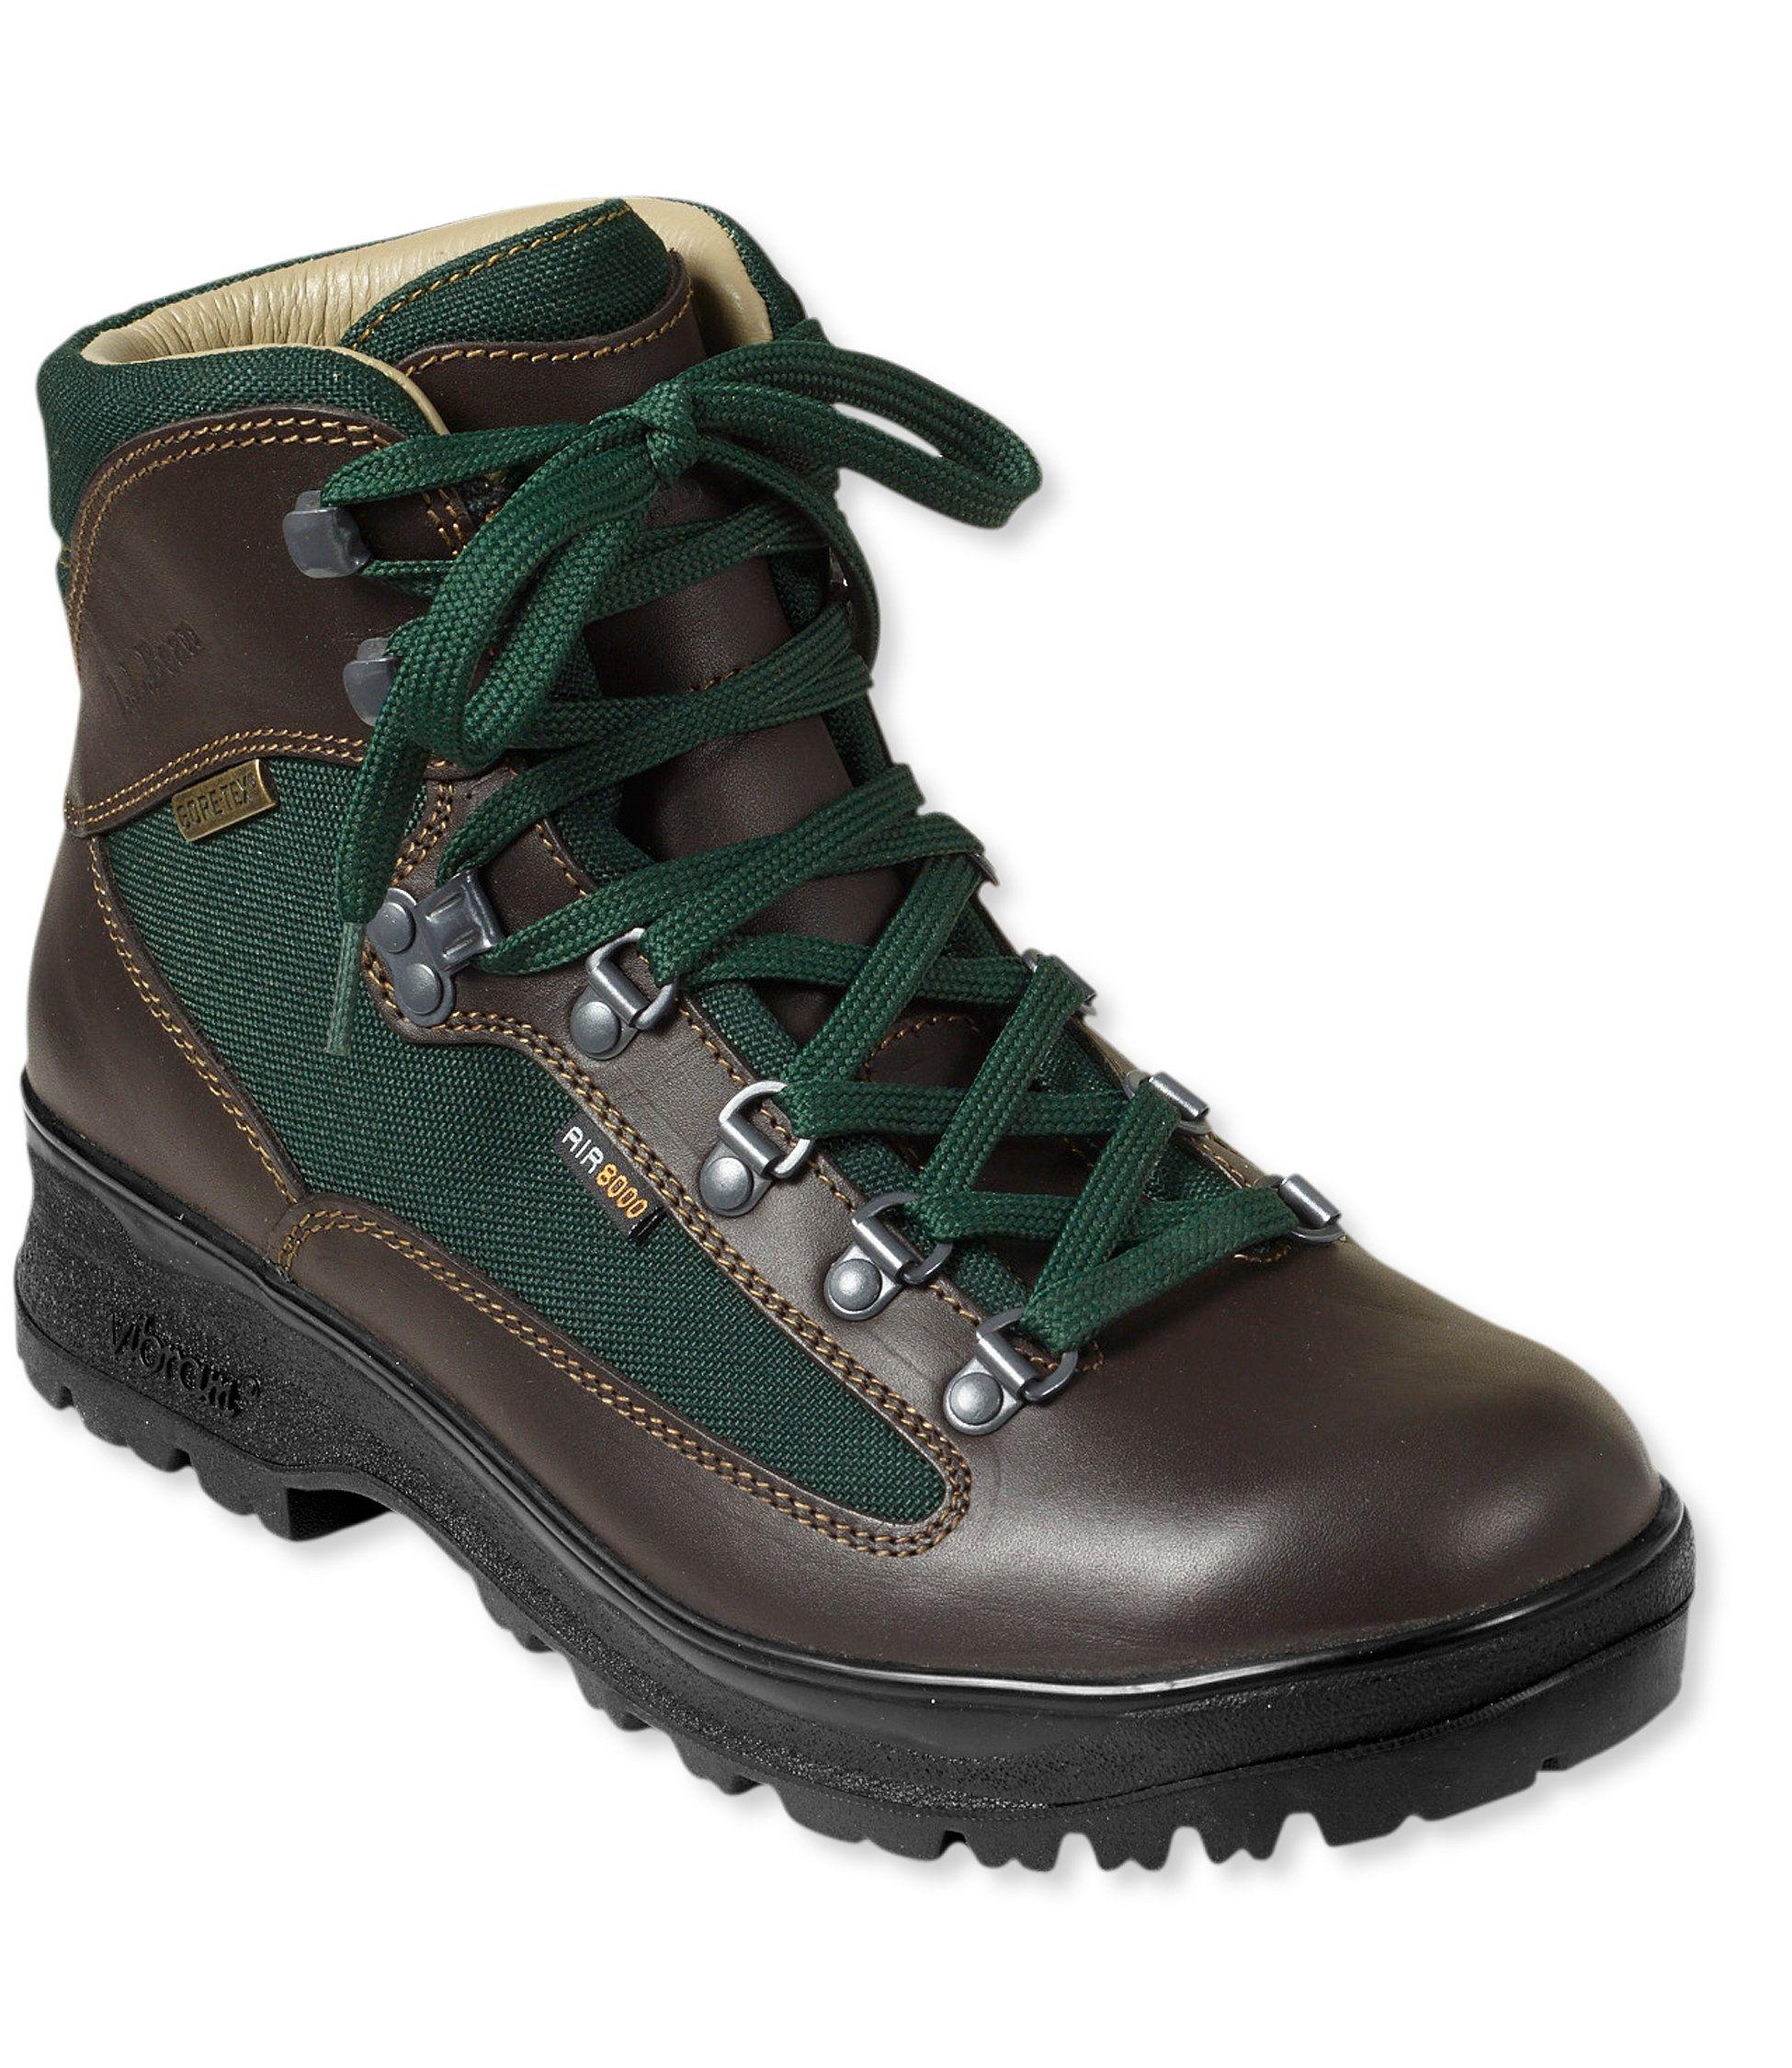 Men s Gore-Tex Cresta Hiking Boots fa5583dc0a1